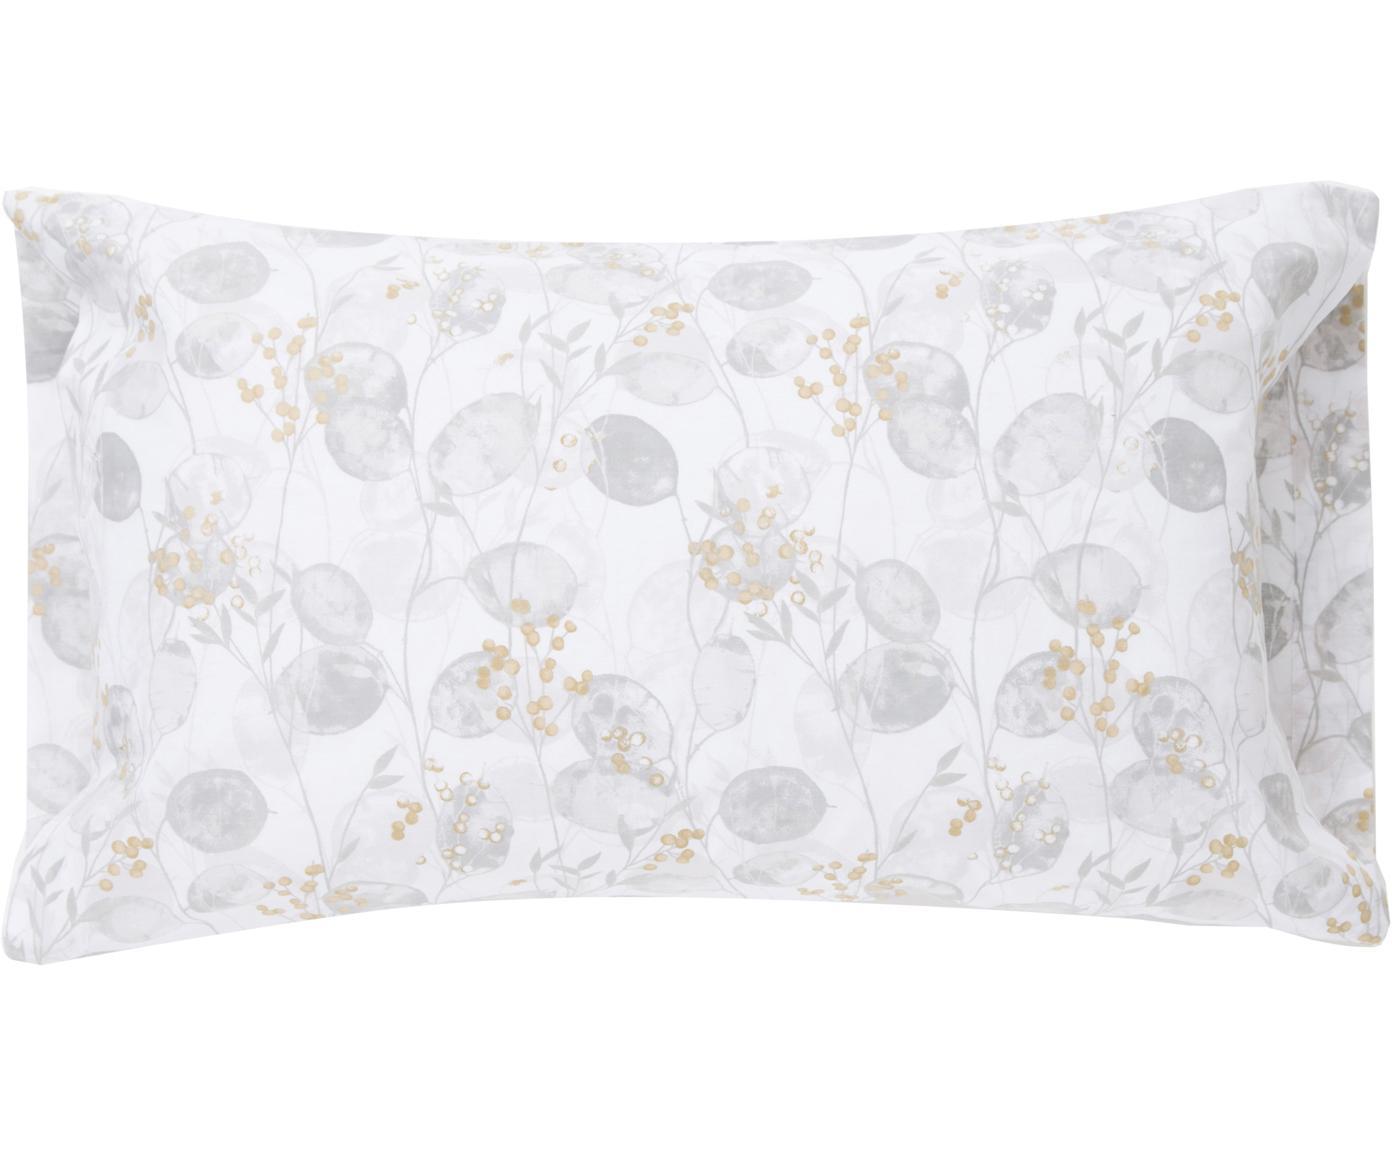 Fundas de almohada Honesty, 2uds., Algodón, Tonos grises, amarillo, An 50 x L 85 cm